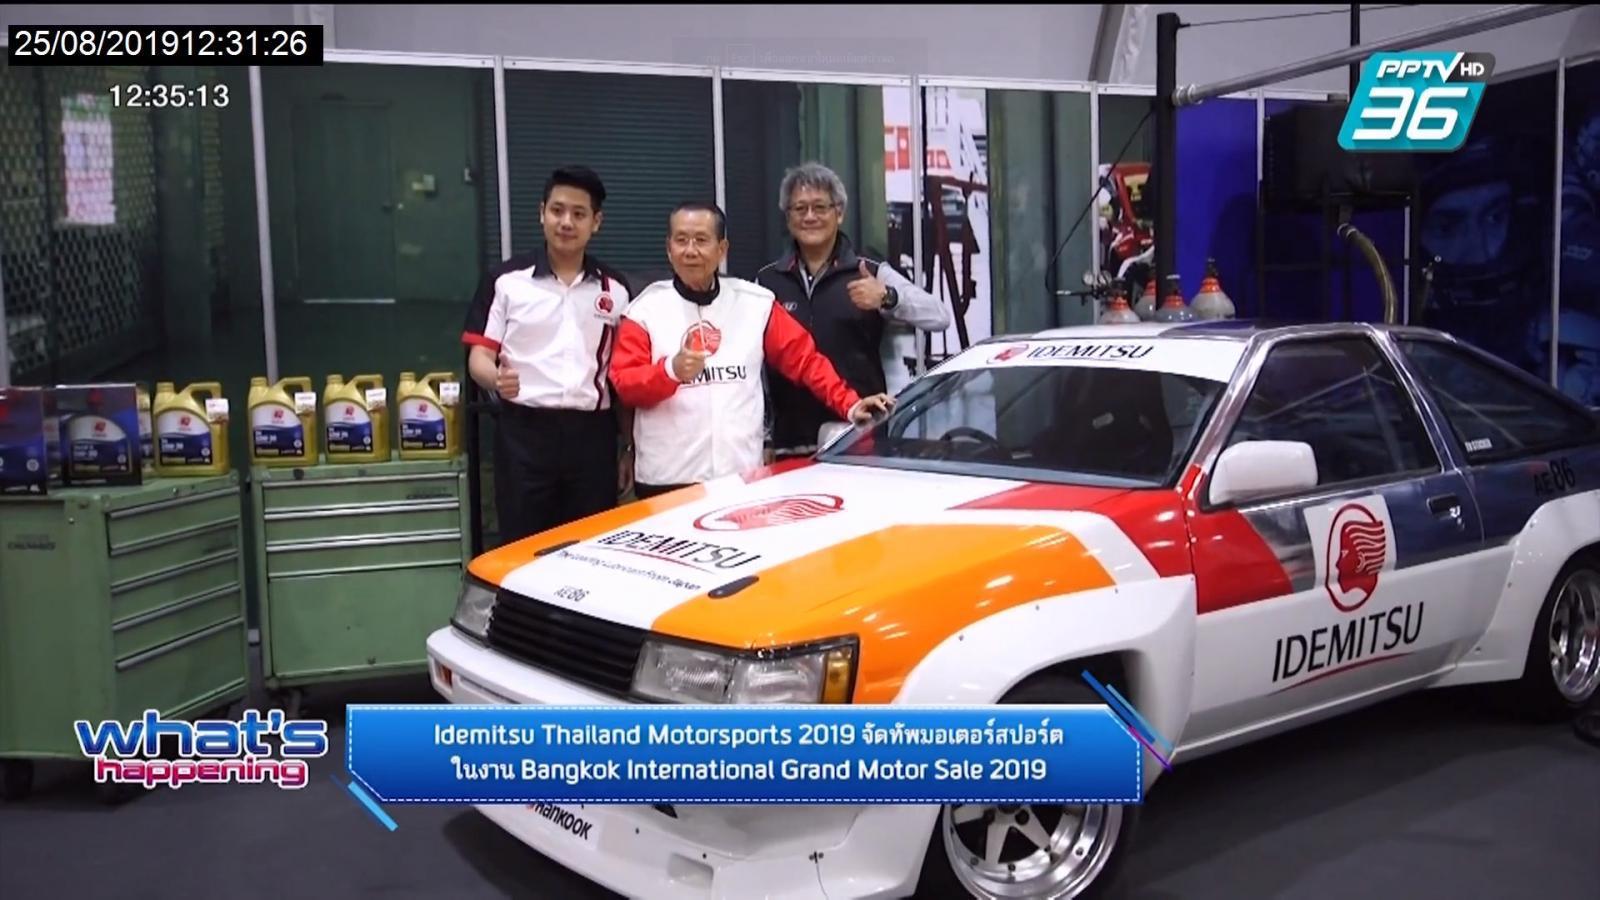 Idemitsu Thailand Motorsports 2019 จัดทัพมอเตอร์สปอร์ต ร่วมงาน Big Motor Sale